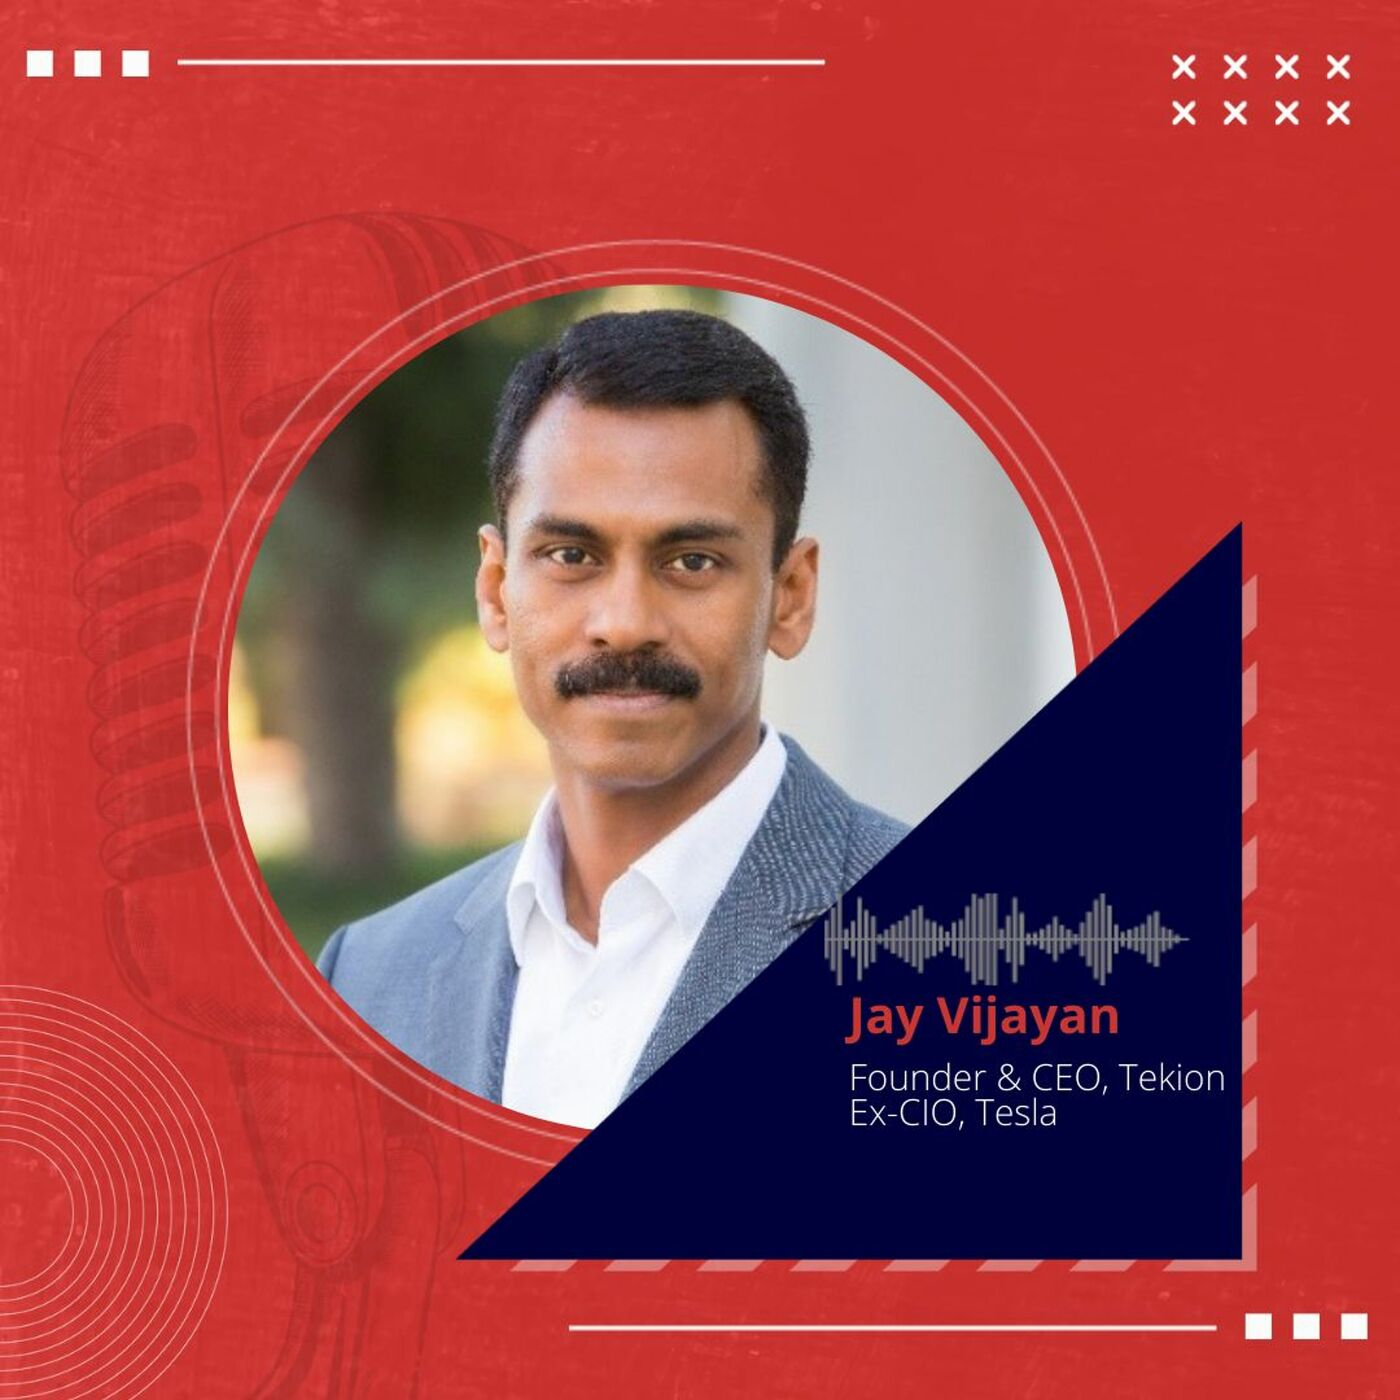 Inside the mind of Jay Vijayan, Founder & CEO, Tekion, Ex-CIO, Tesla